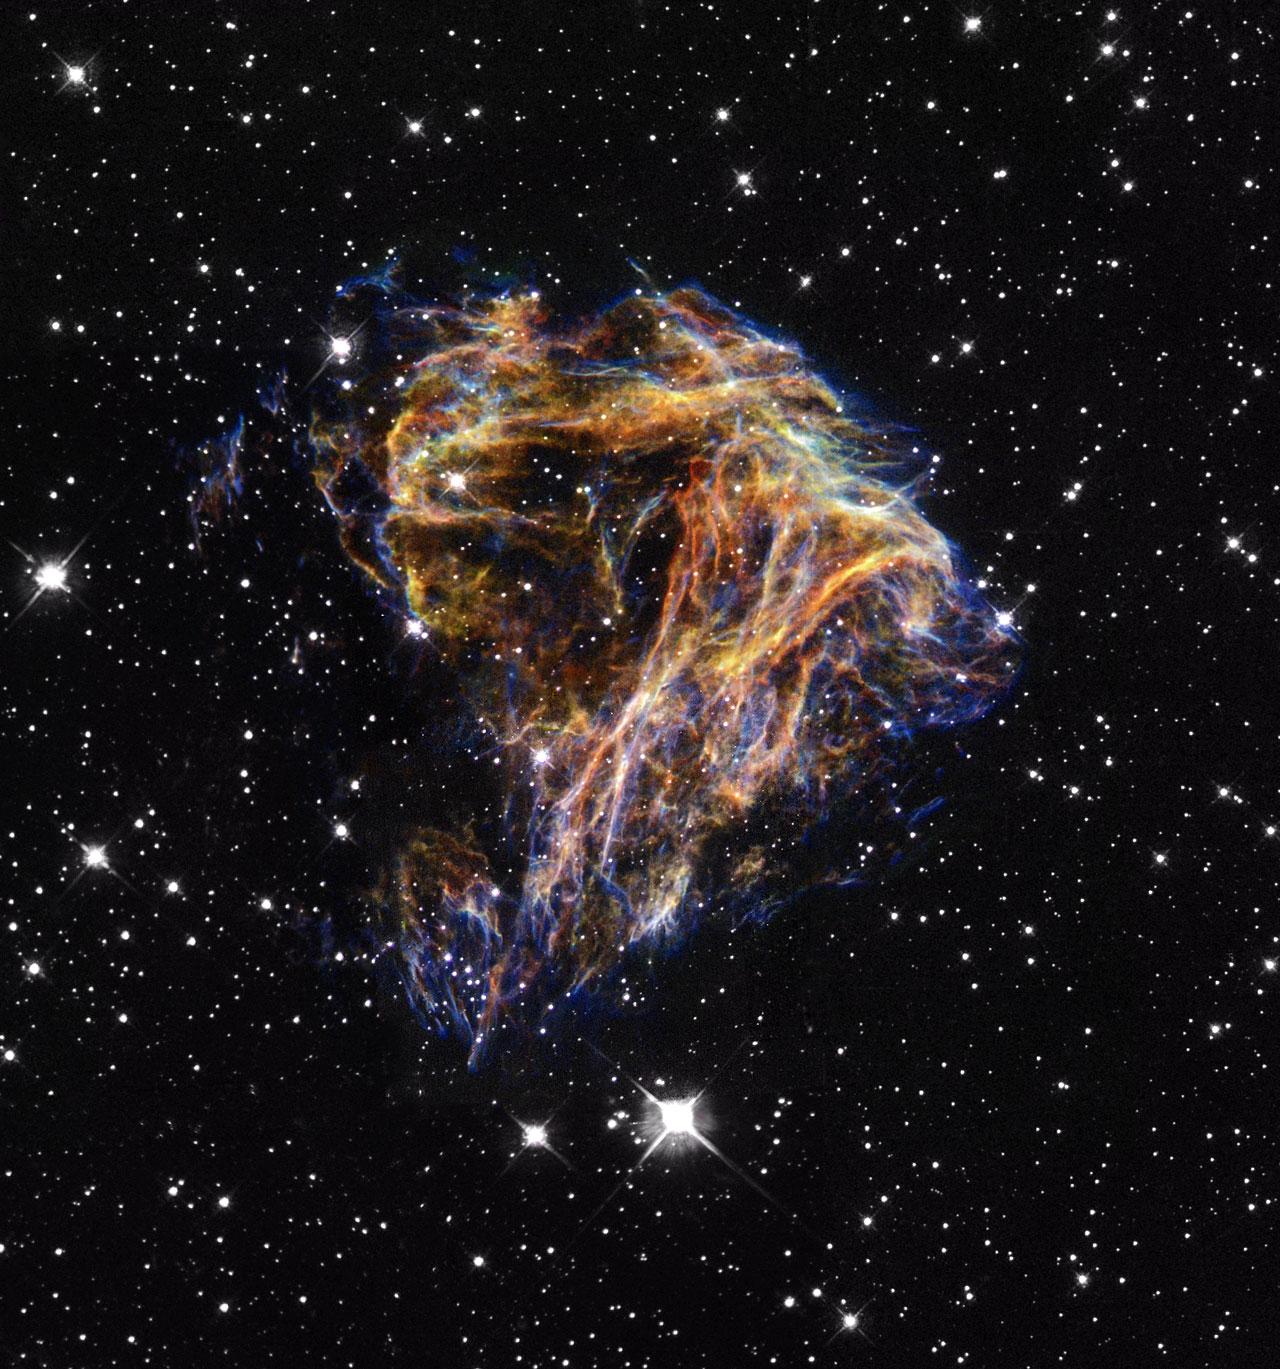 nasa archive astronomy - photo #2